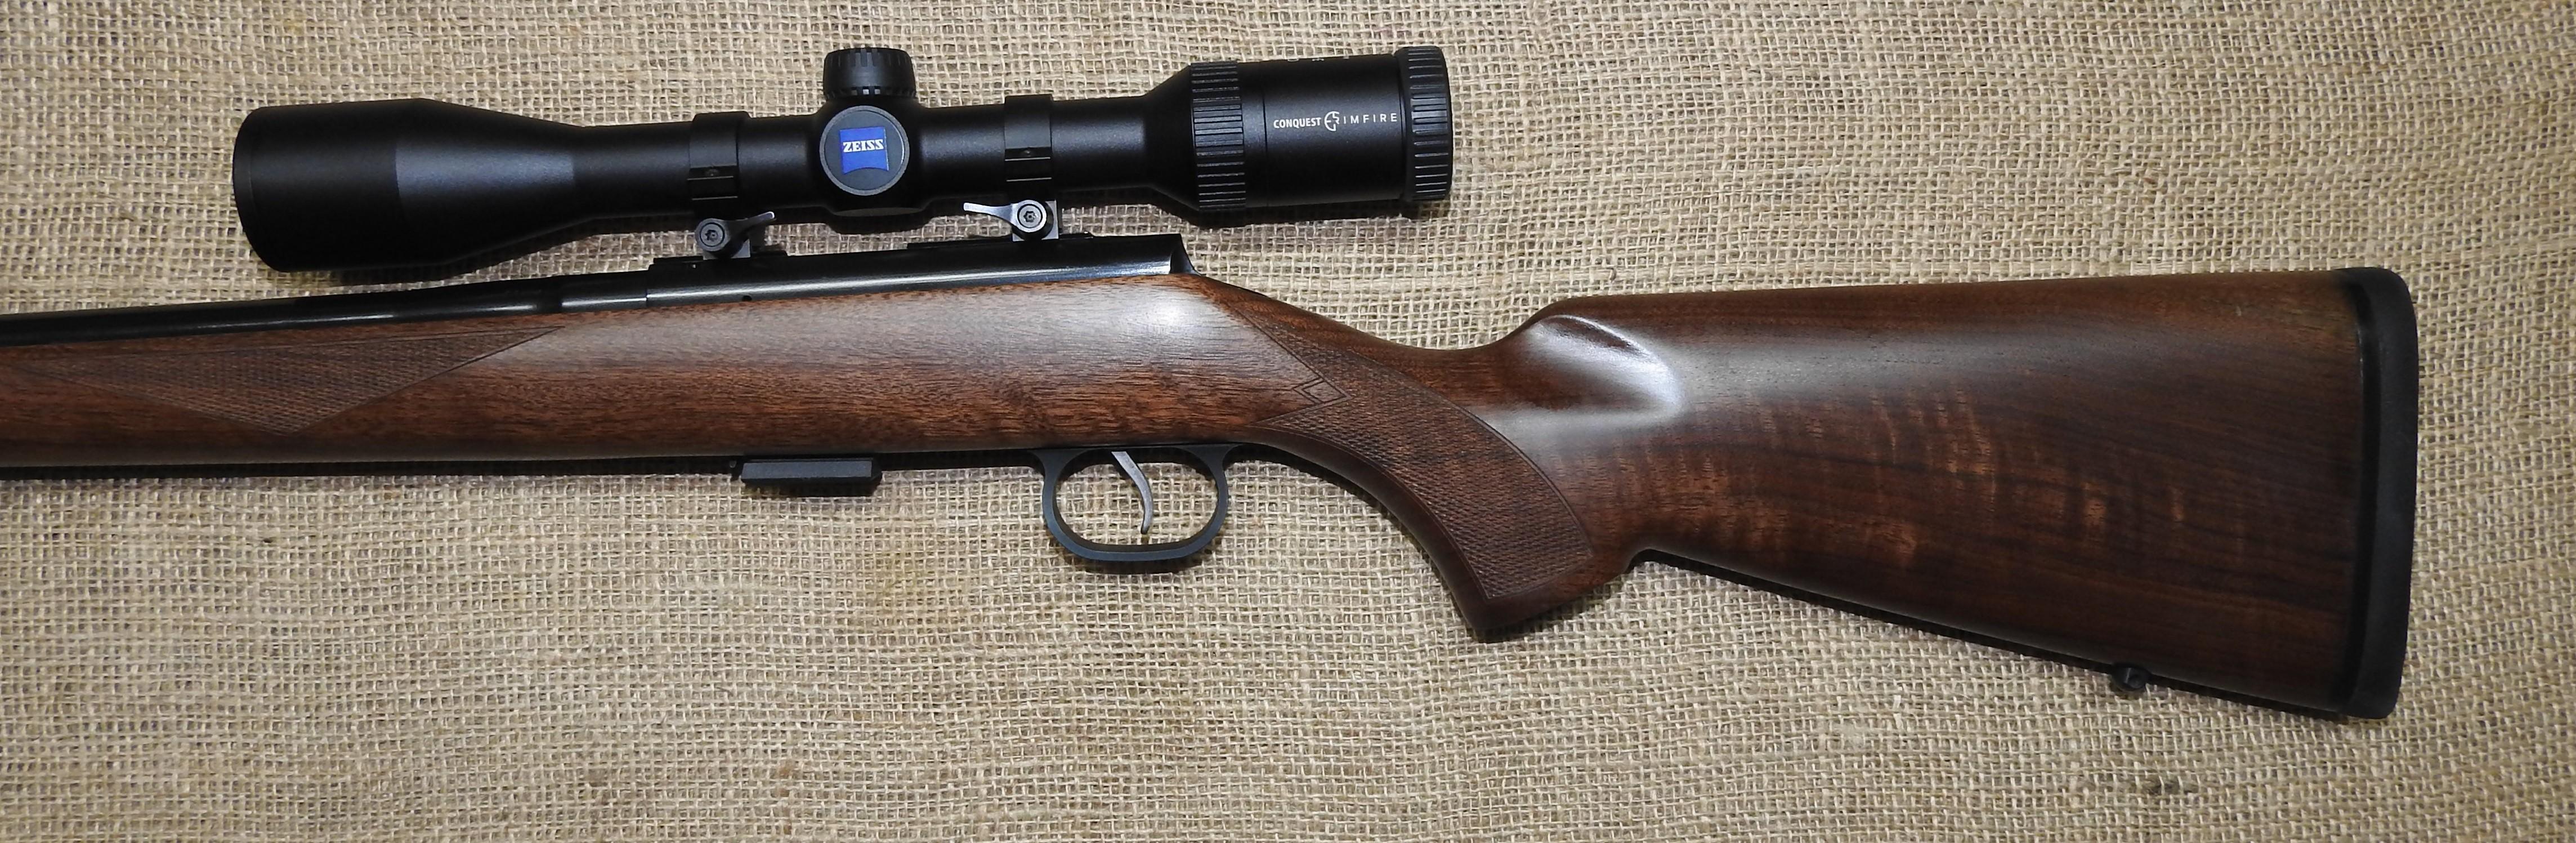 Iof 22 Lr Sk Guns Amp Tackle